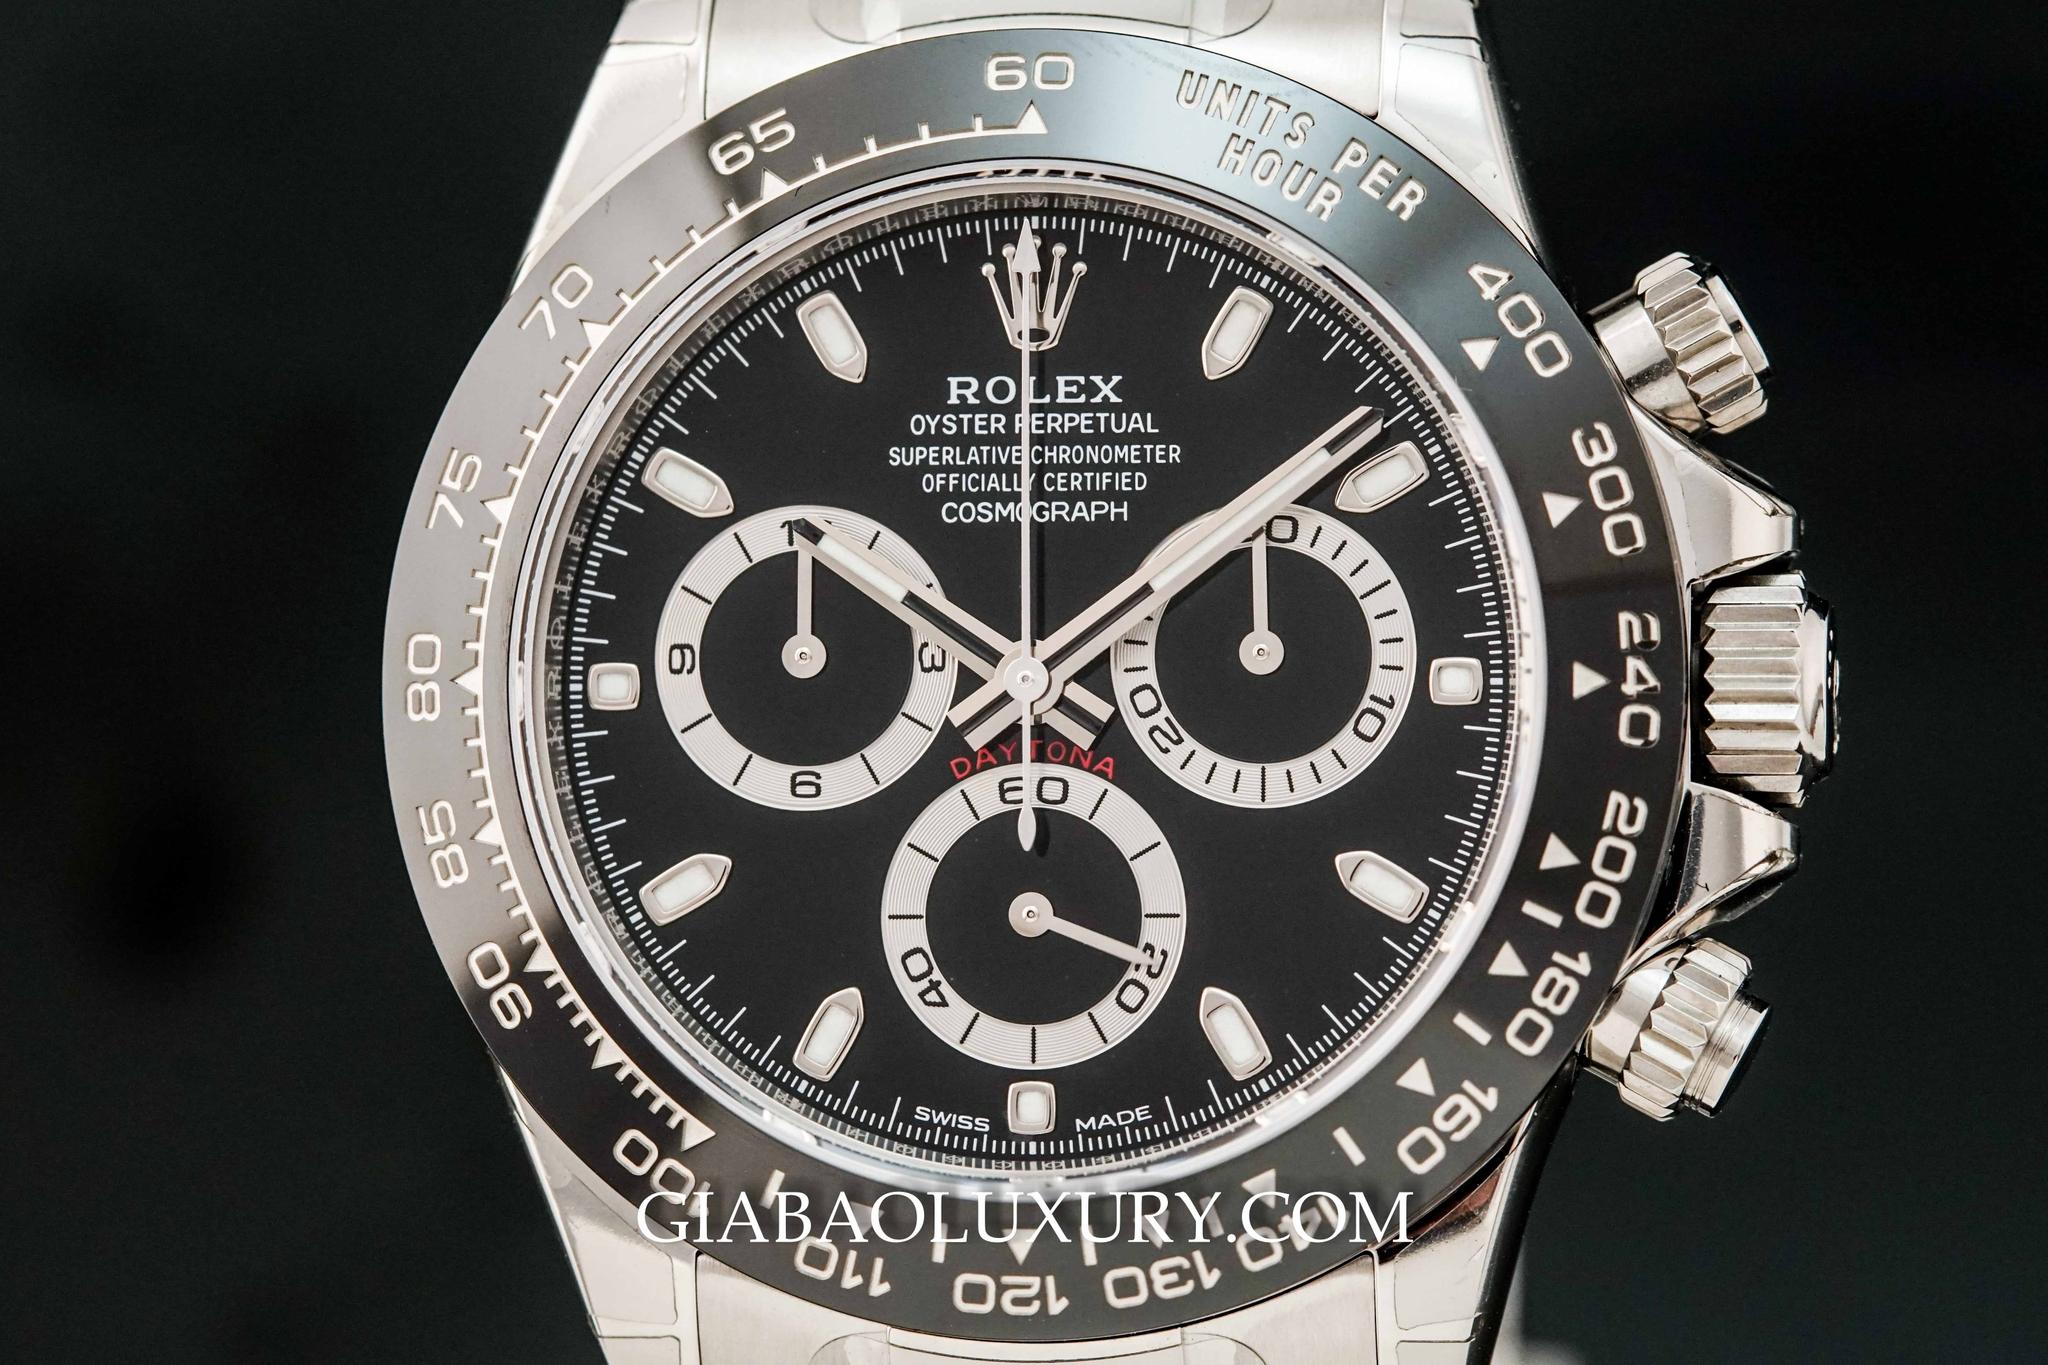 Đồng Hồ Rolex Cosmogrpaph Daytona 116500LN